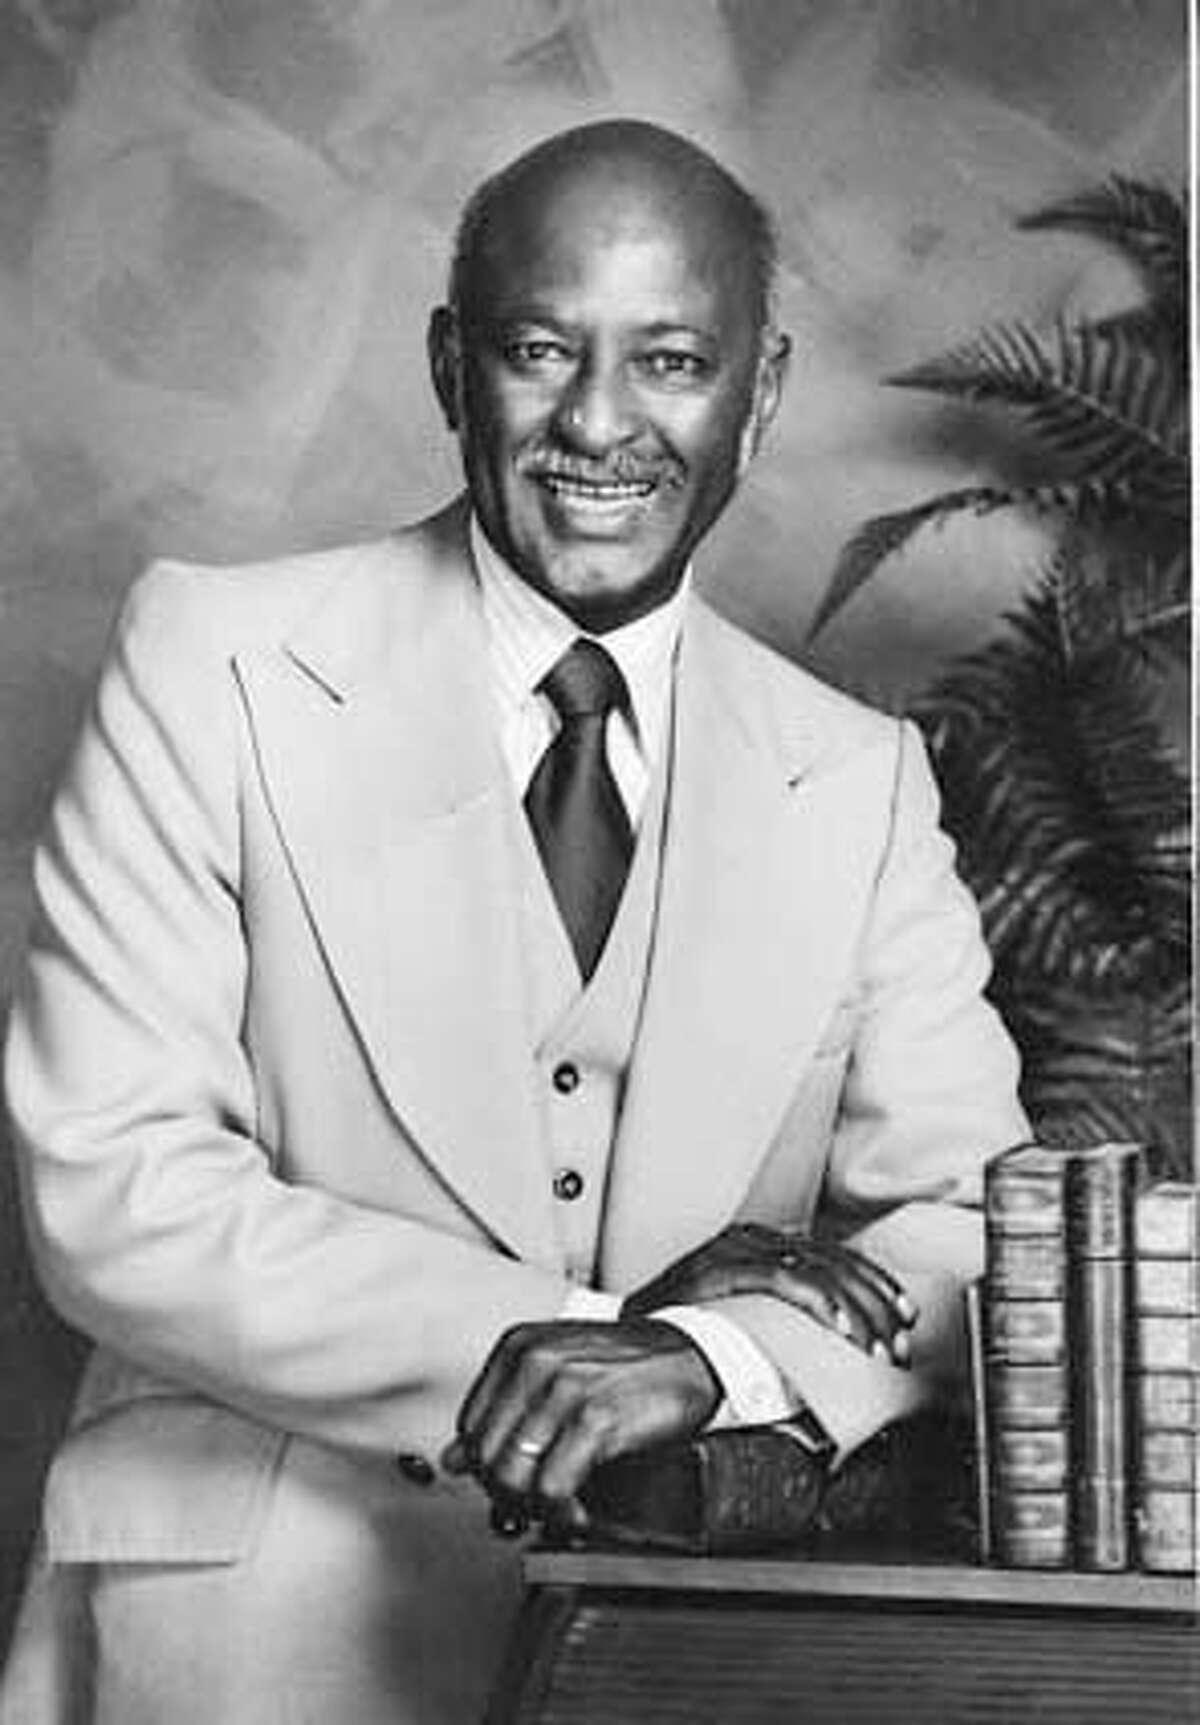 Obituary photo of Carter Gilmore.